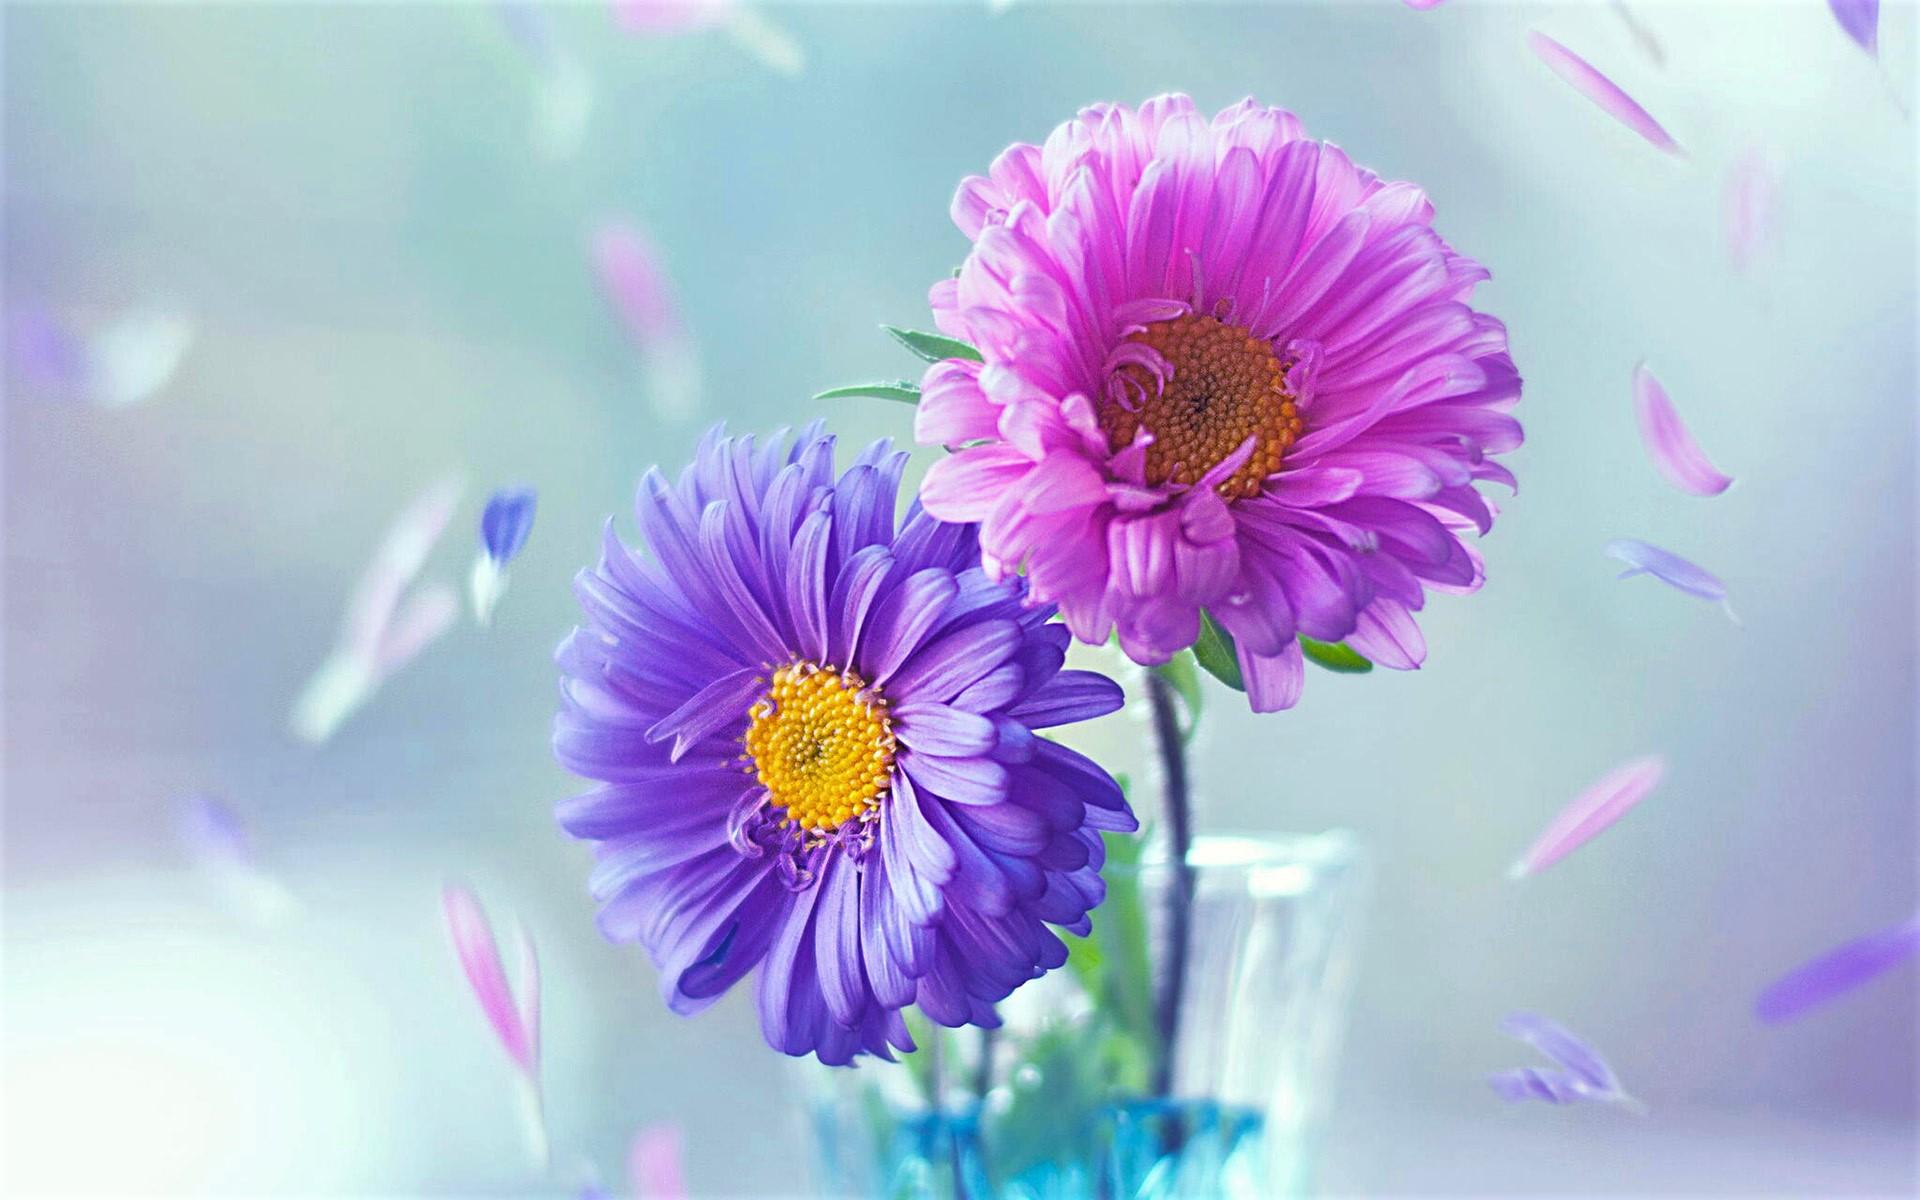 hinh anh hoa cuc dep 75